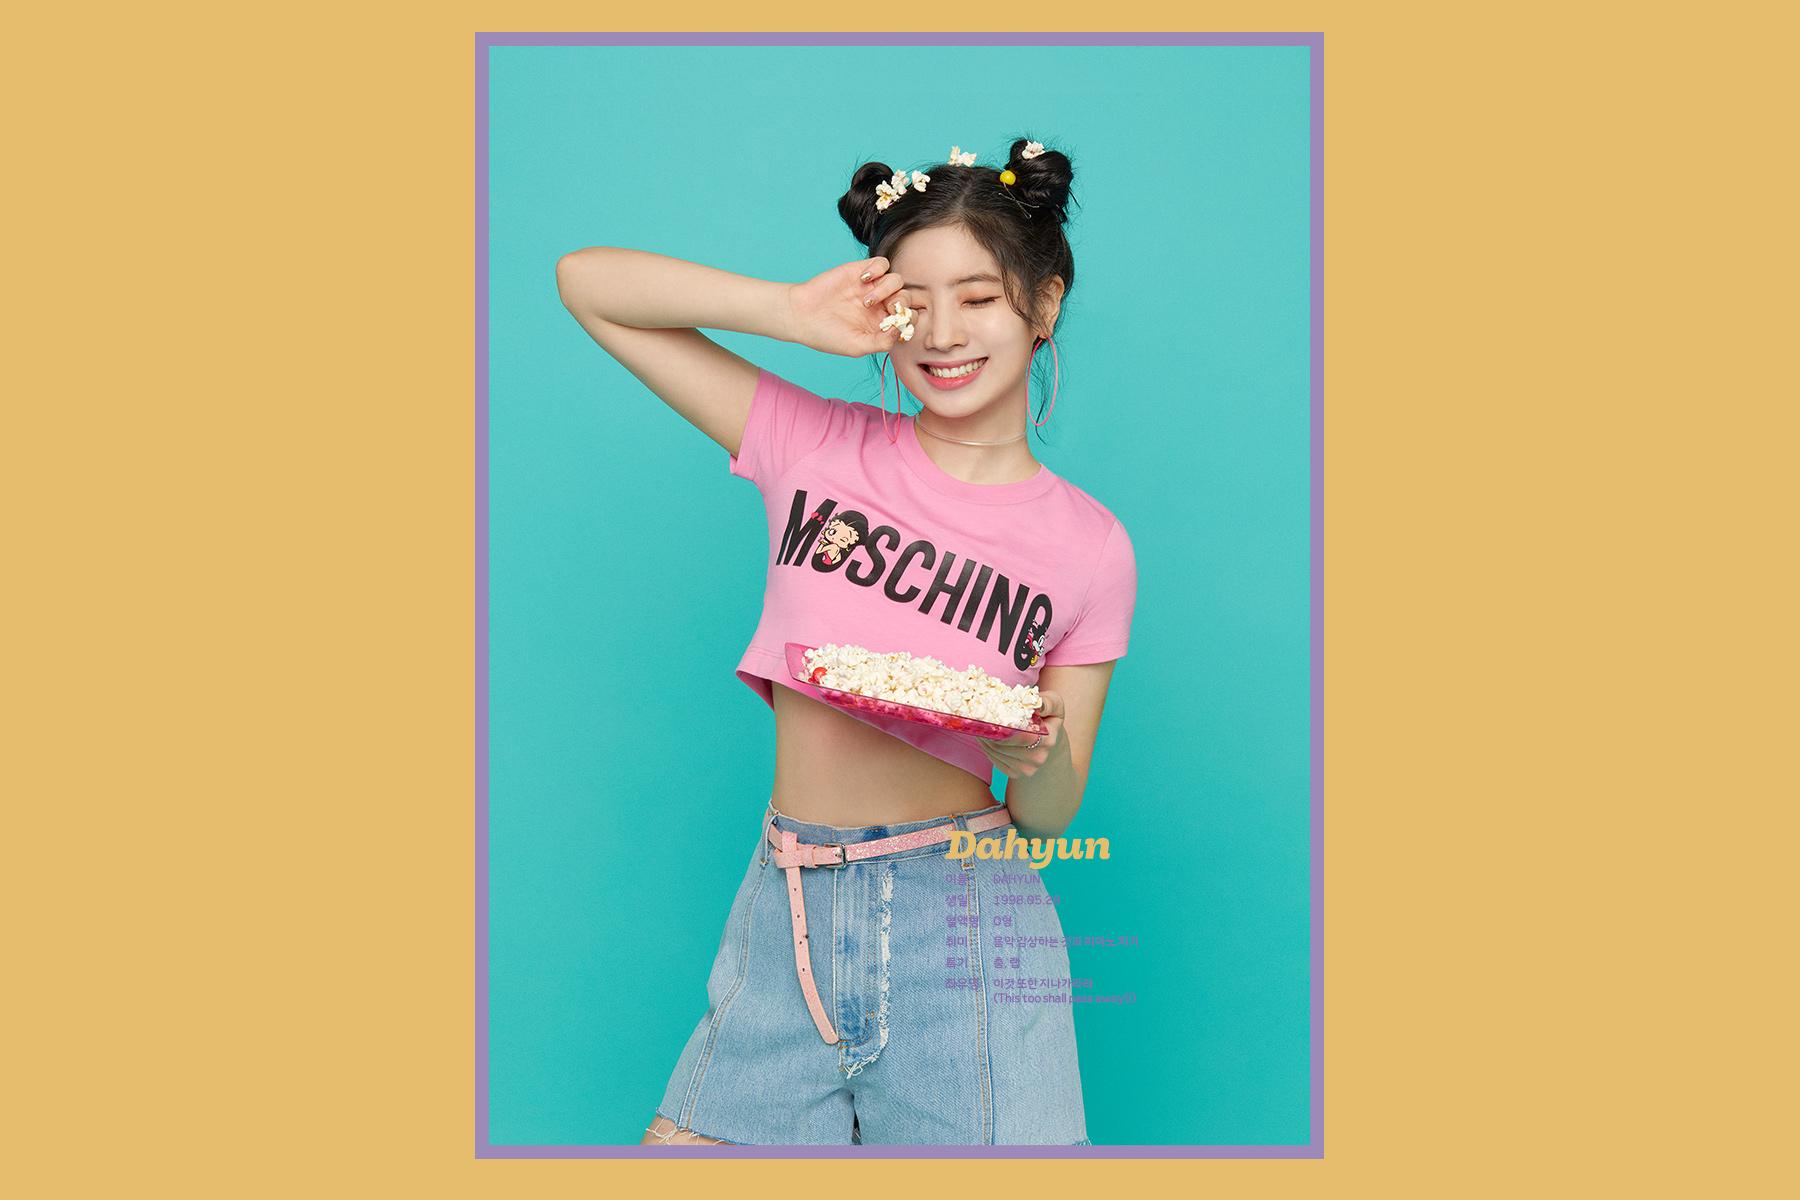 twice, dahyun, monsta x , jooheon, twice dahyun, monsta x jooheon, kpop couple, kpop fantasy, kpop pairing, kpop shipping,